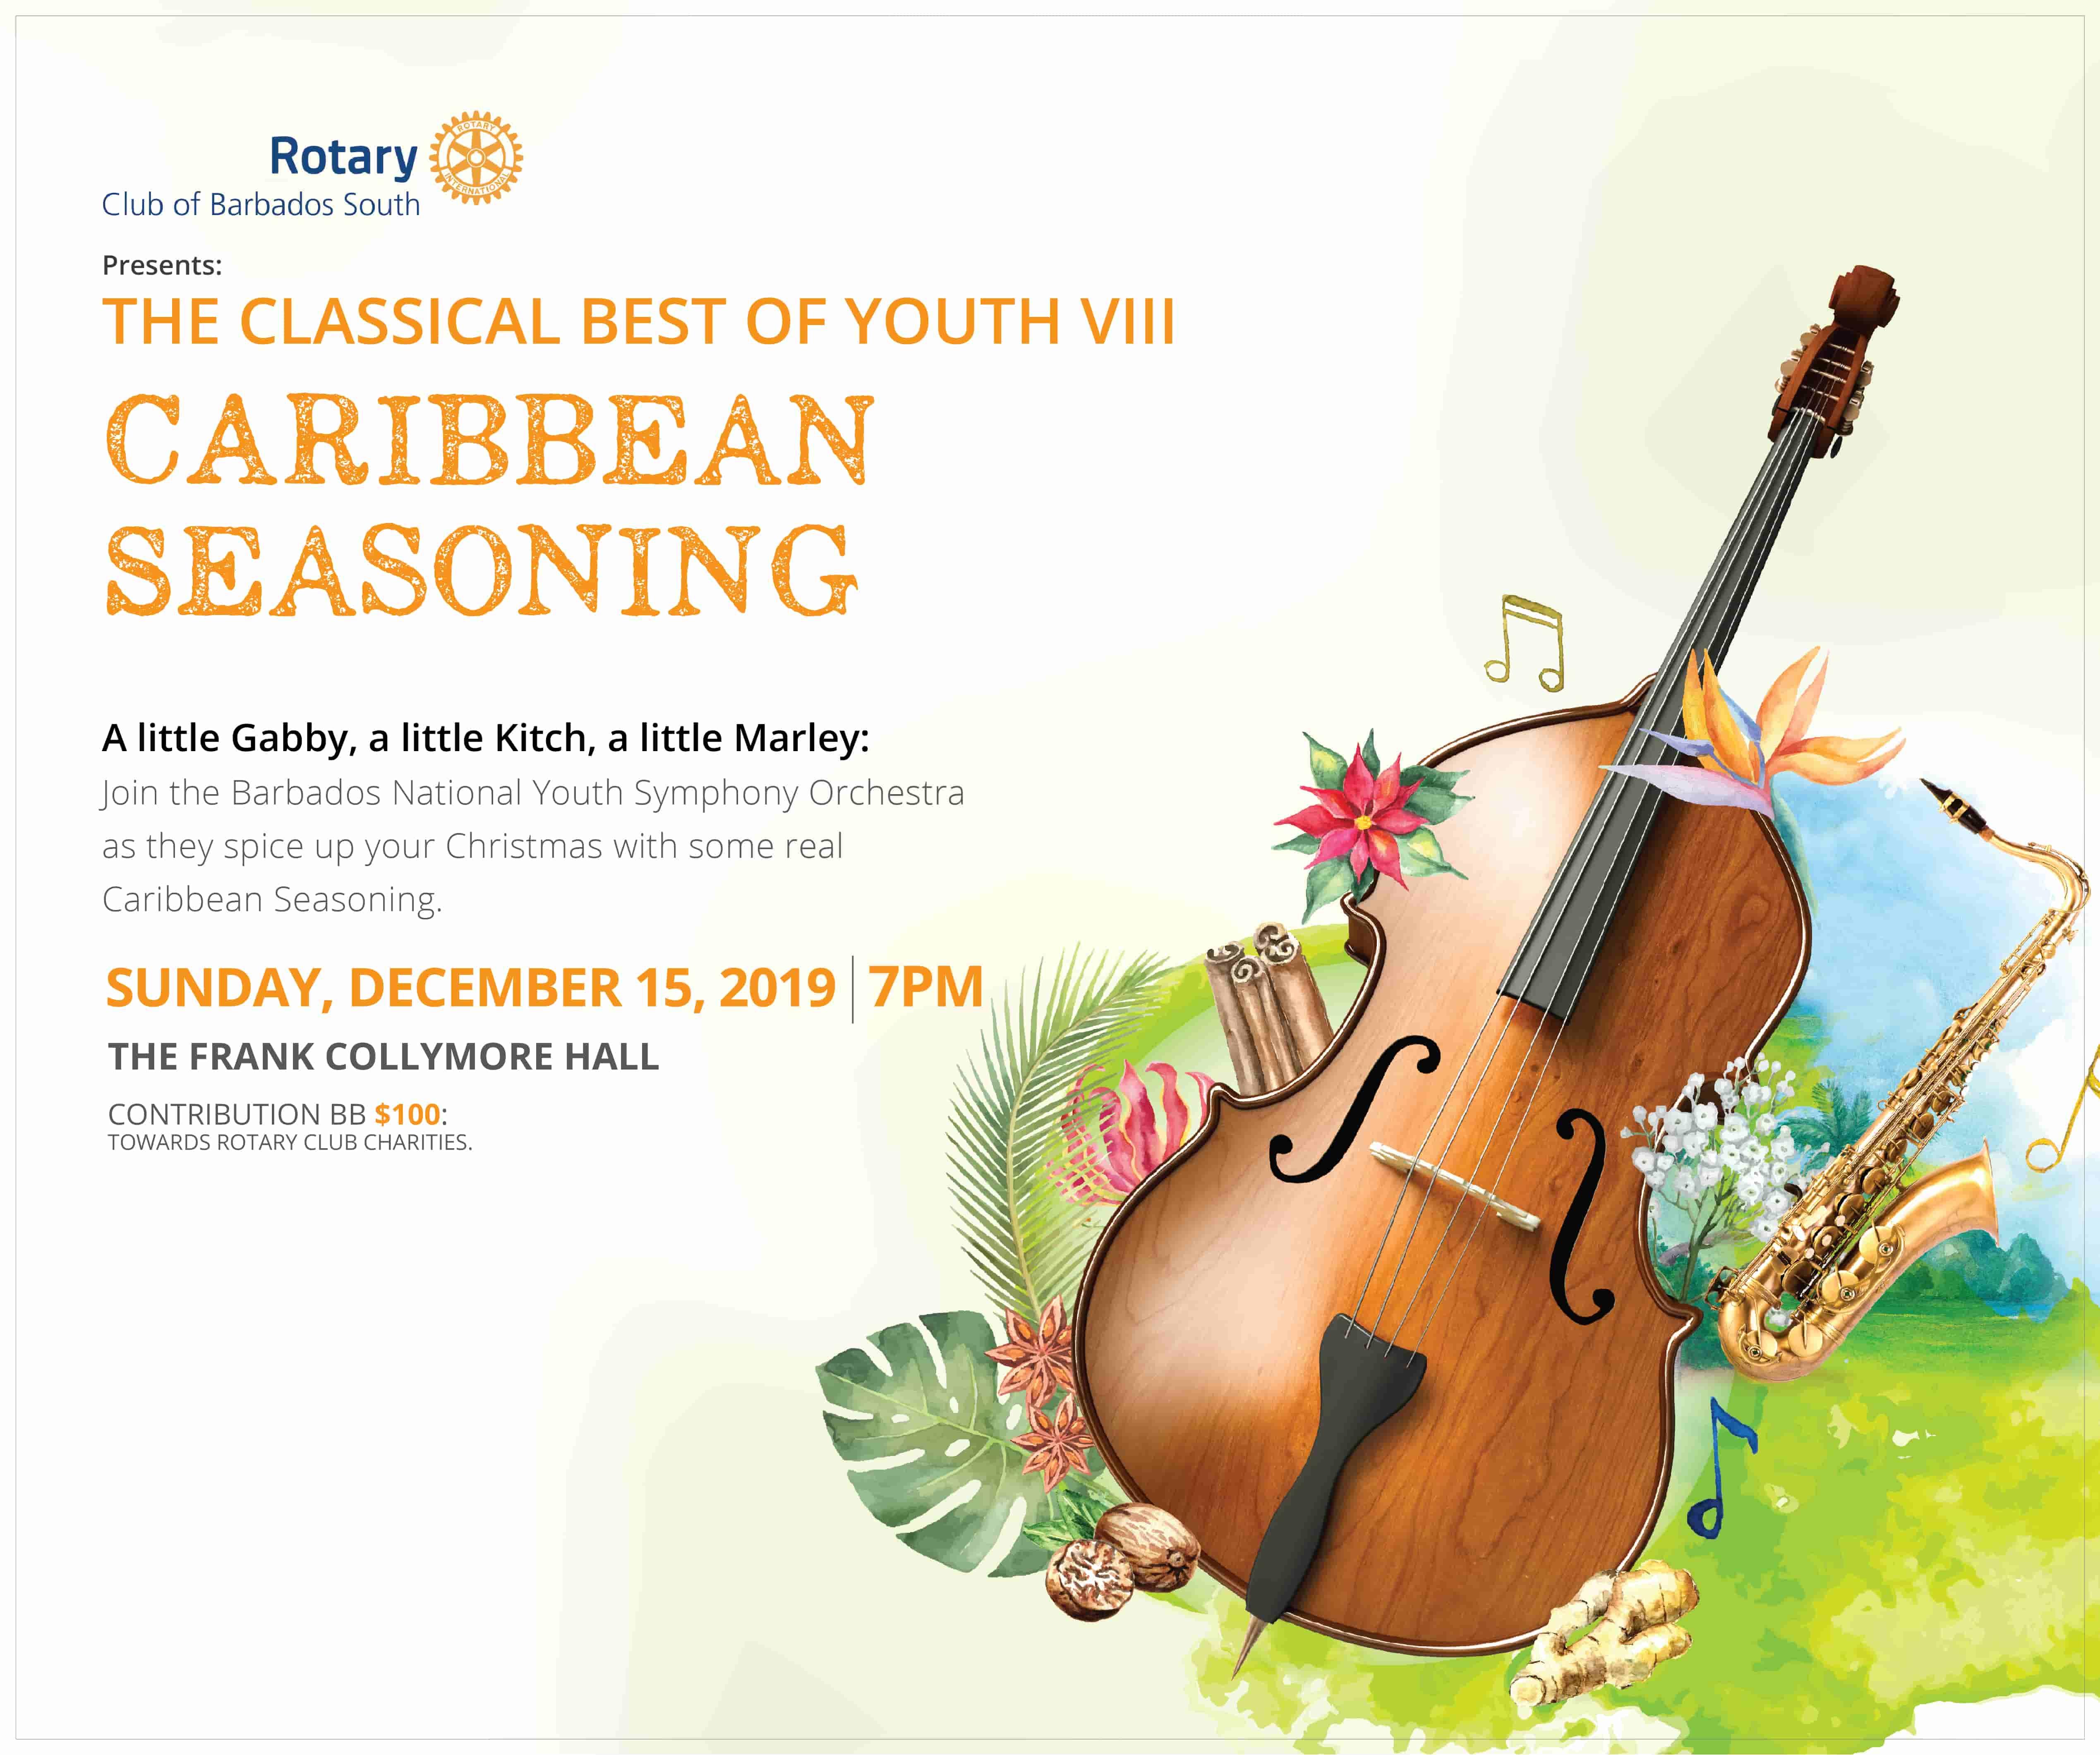 CLASSICAL BEST OF YOUTH VIII - Caribbean Seasoning